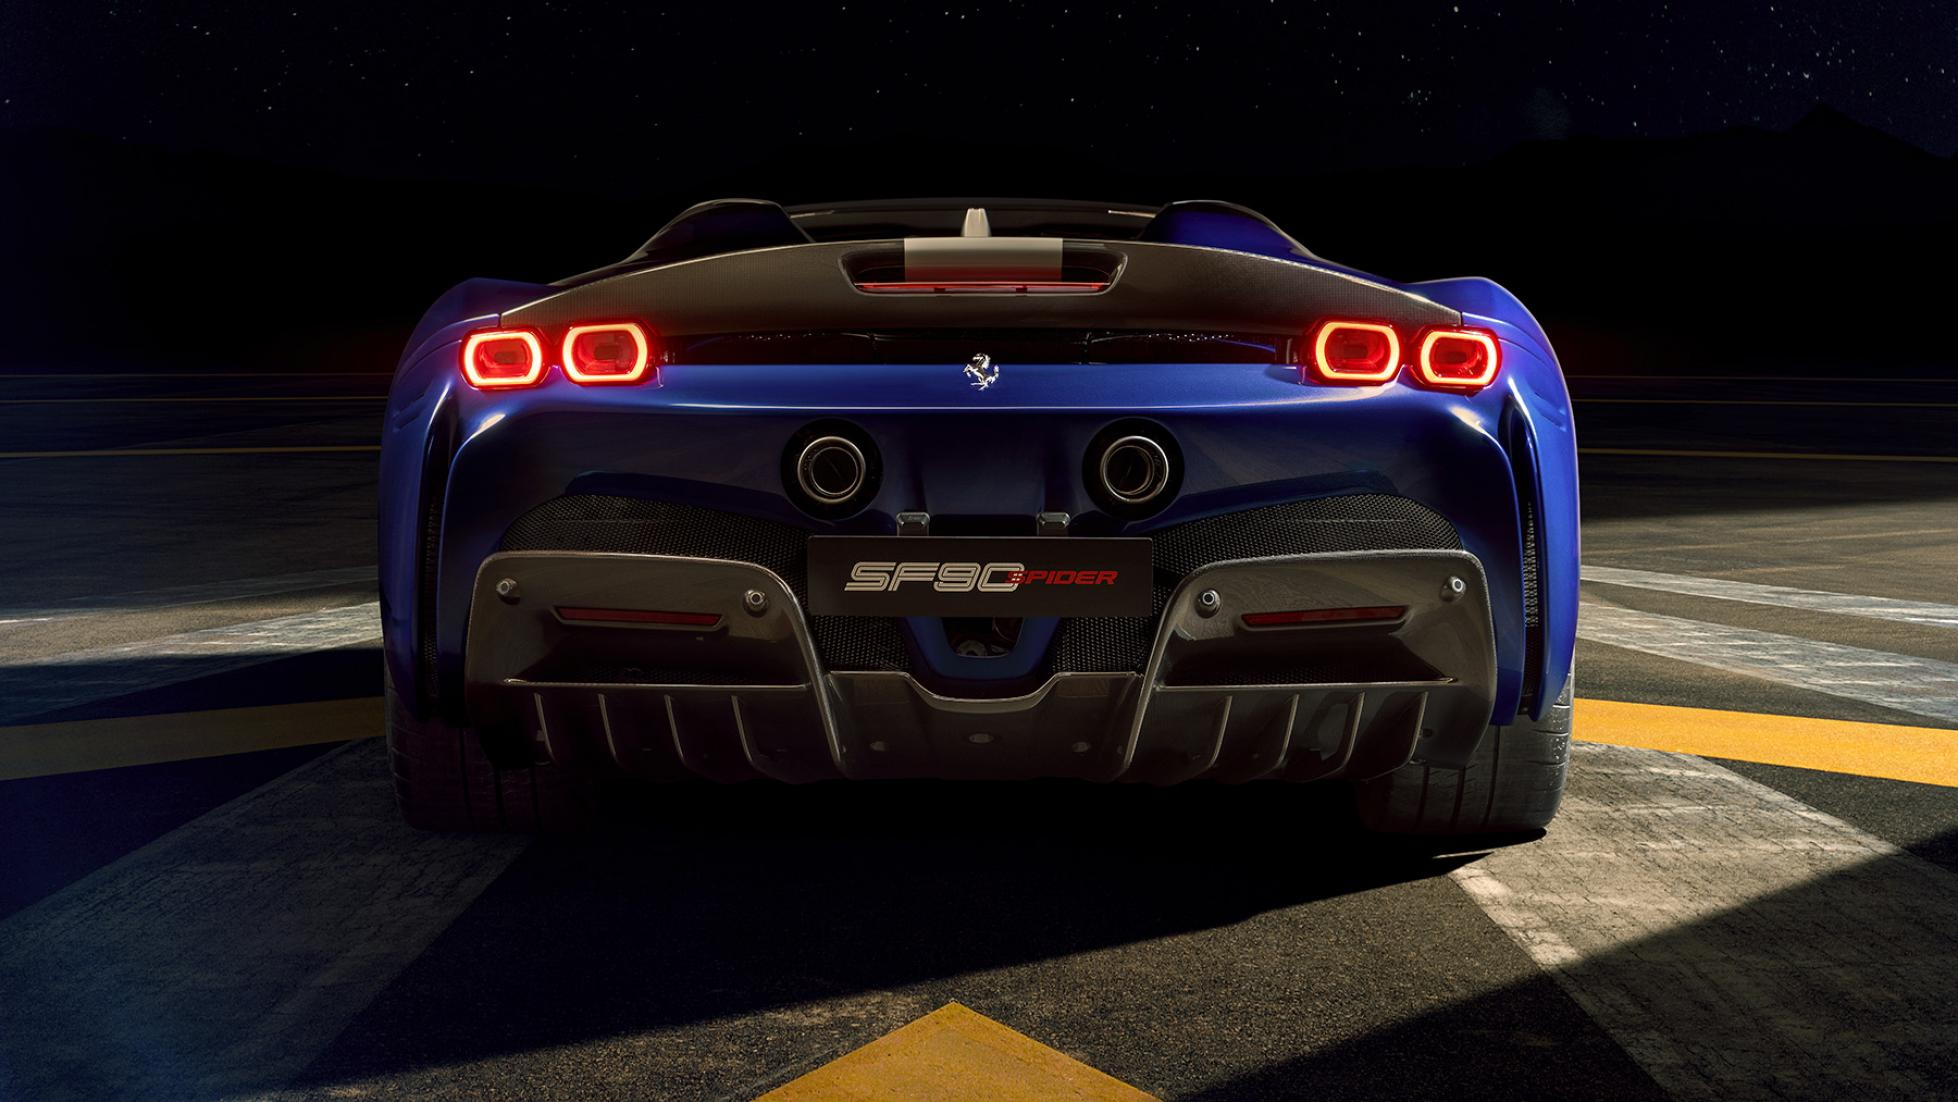 Ferrari-sf90-spider-retro-blu